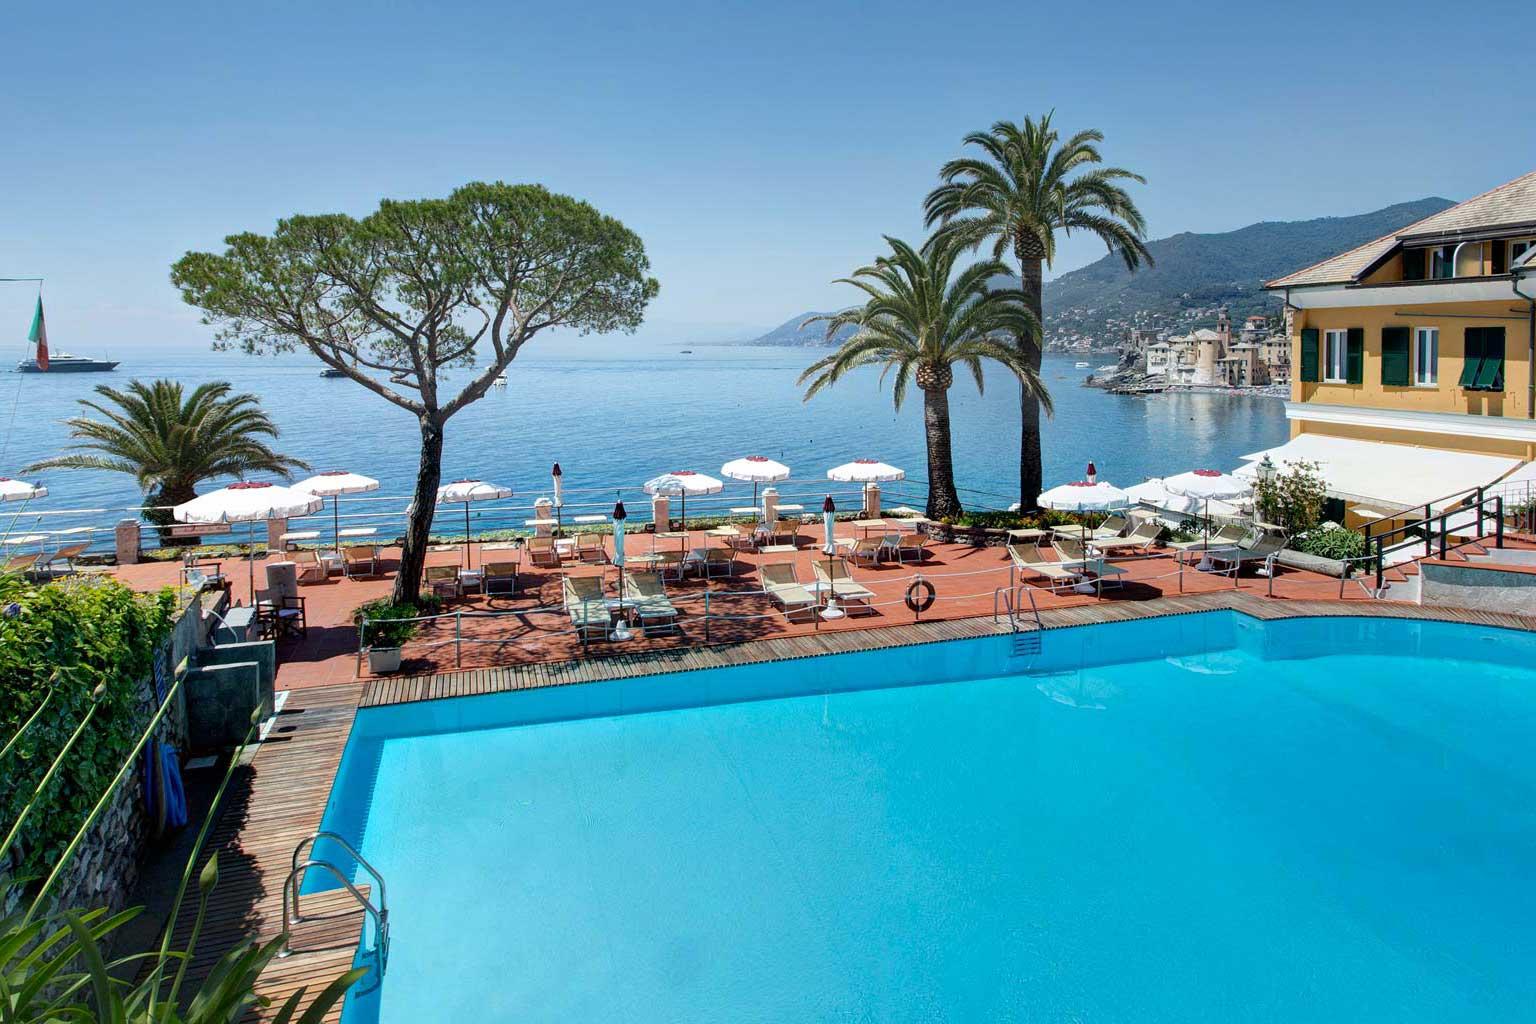 Hotel Cenobio dei Dogi - piscina2